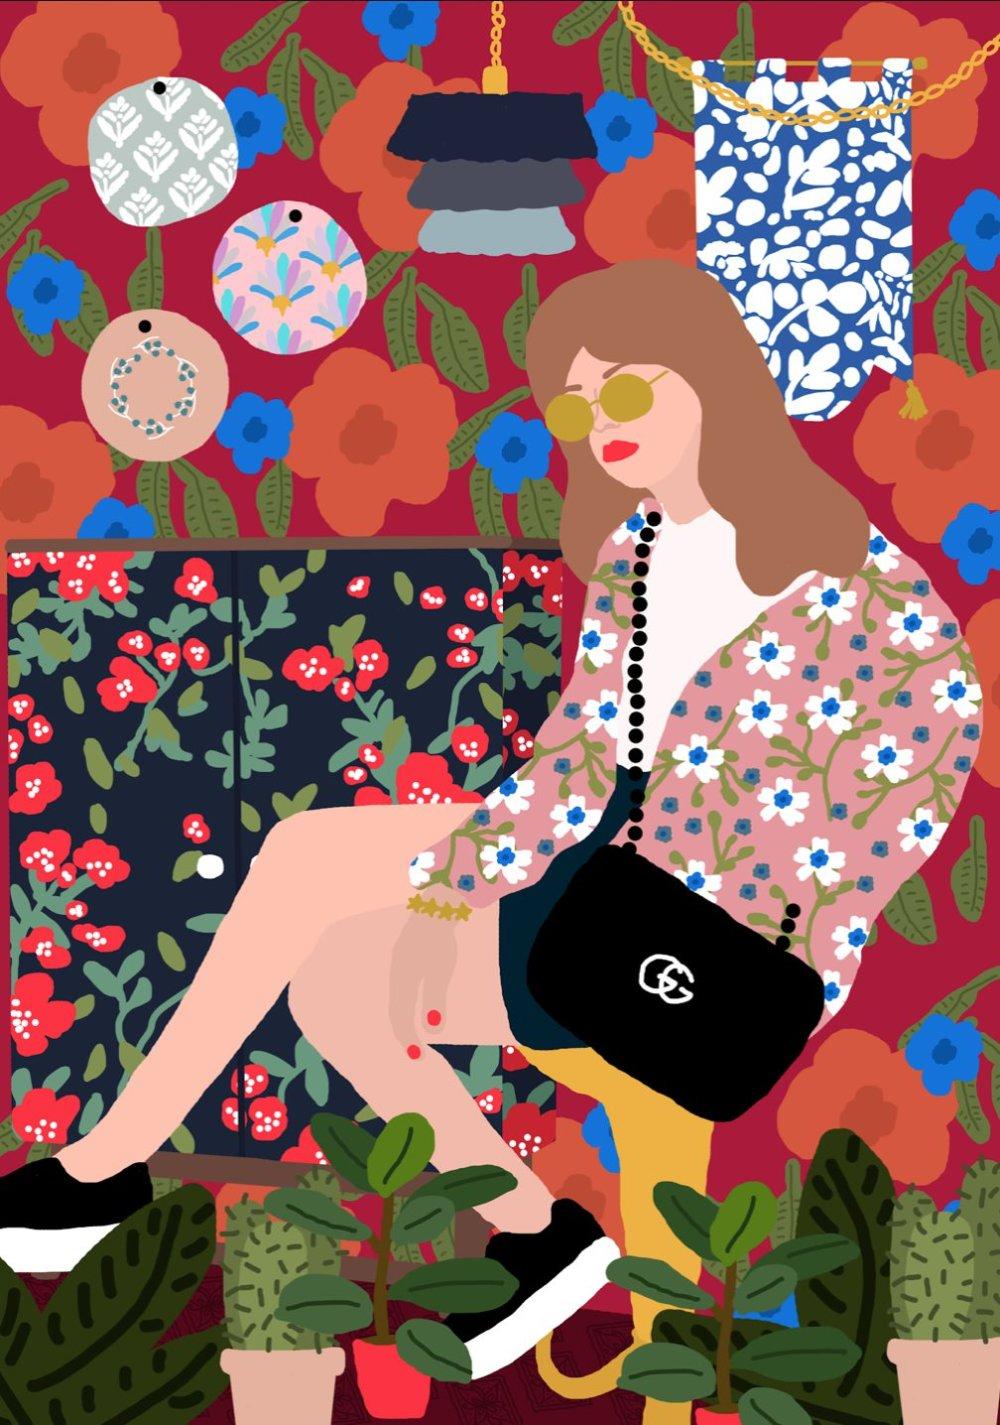 Gorgeous And Colorful Floral Illustrations By Rafaela Mascaro 2